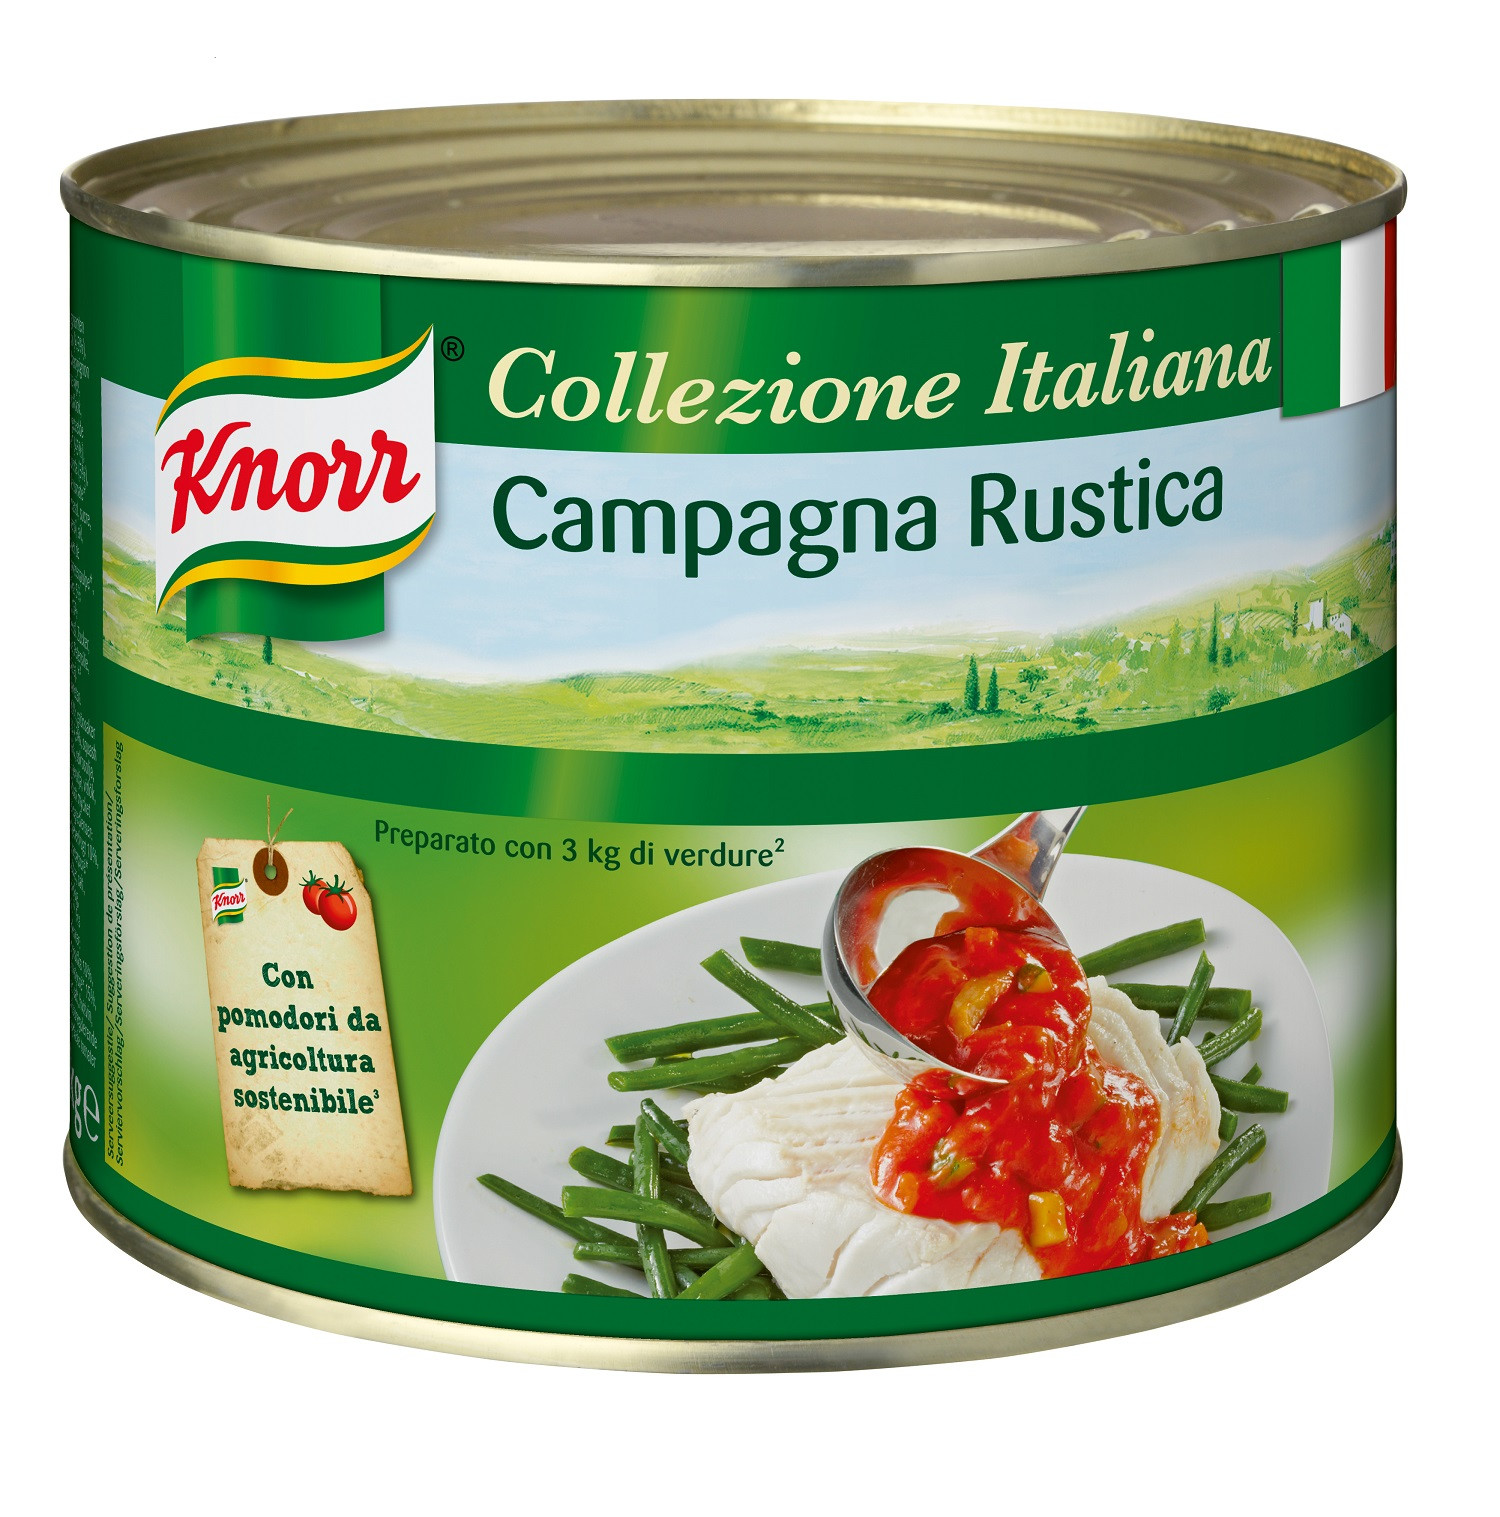 Knorr campagnasaus 3l blik collezione italiana